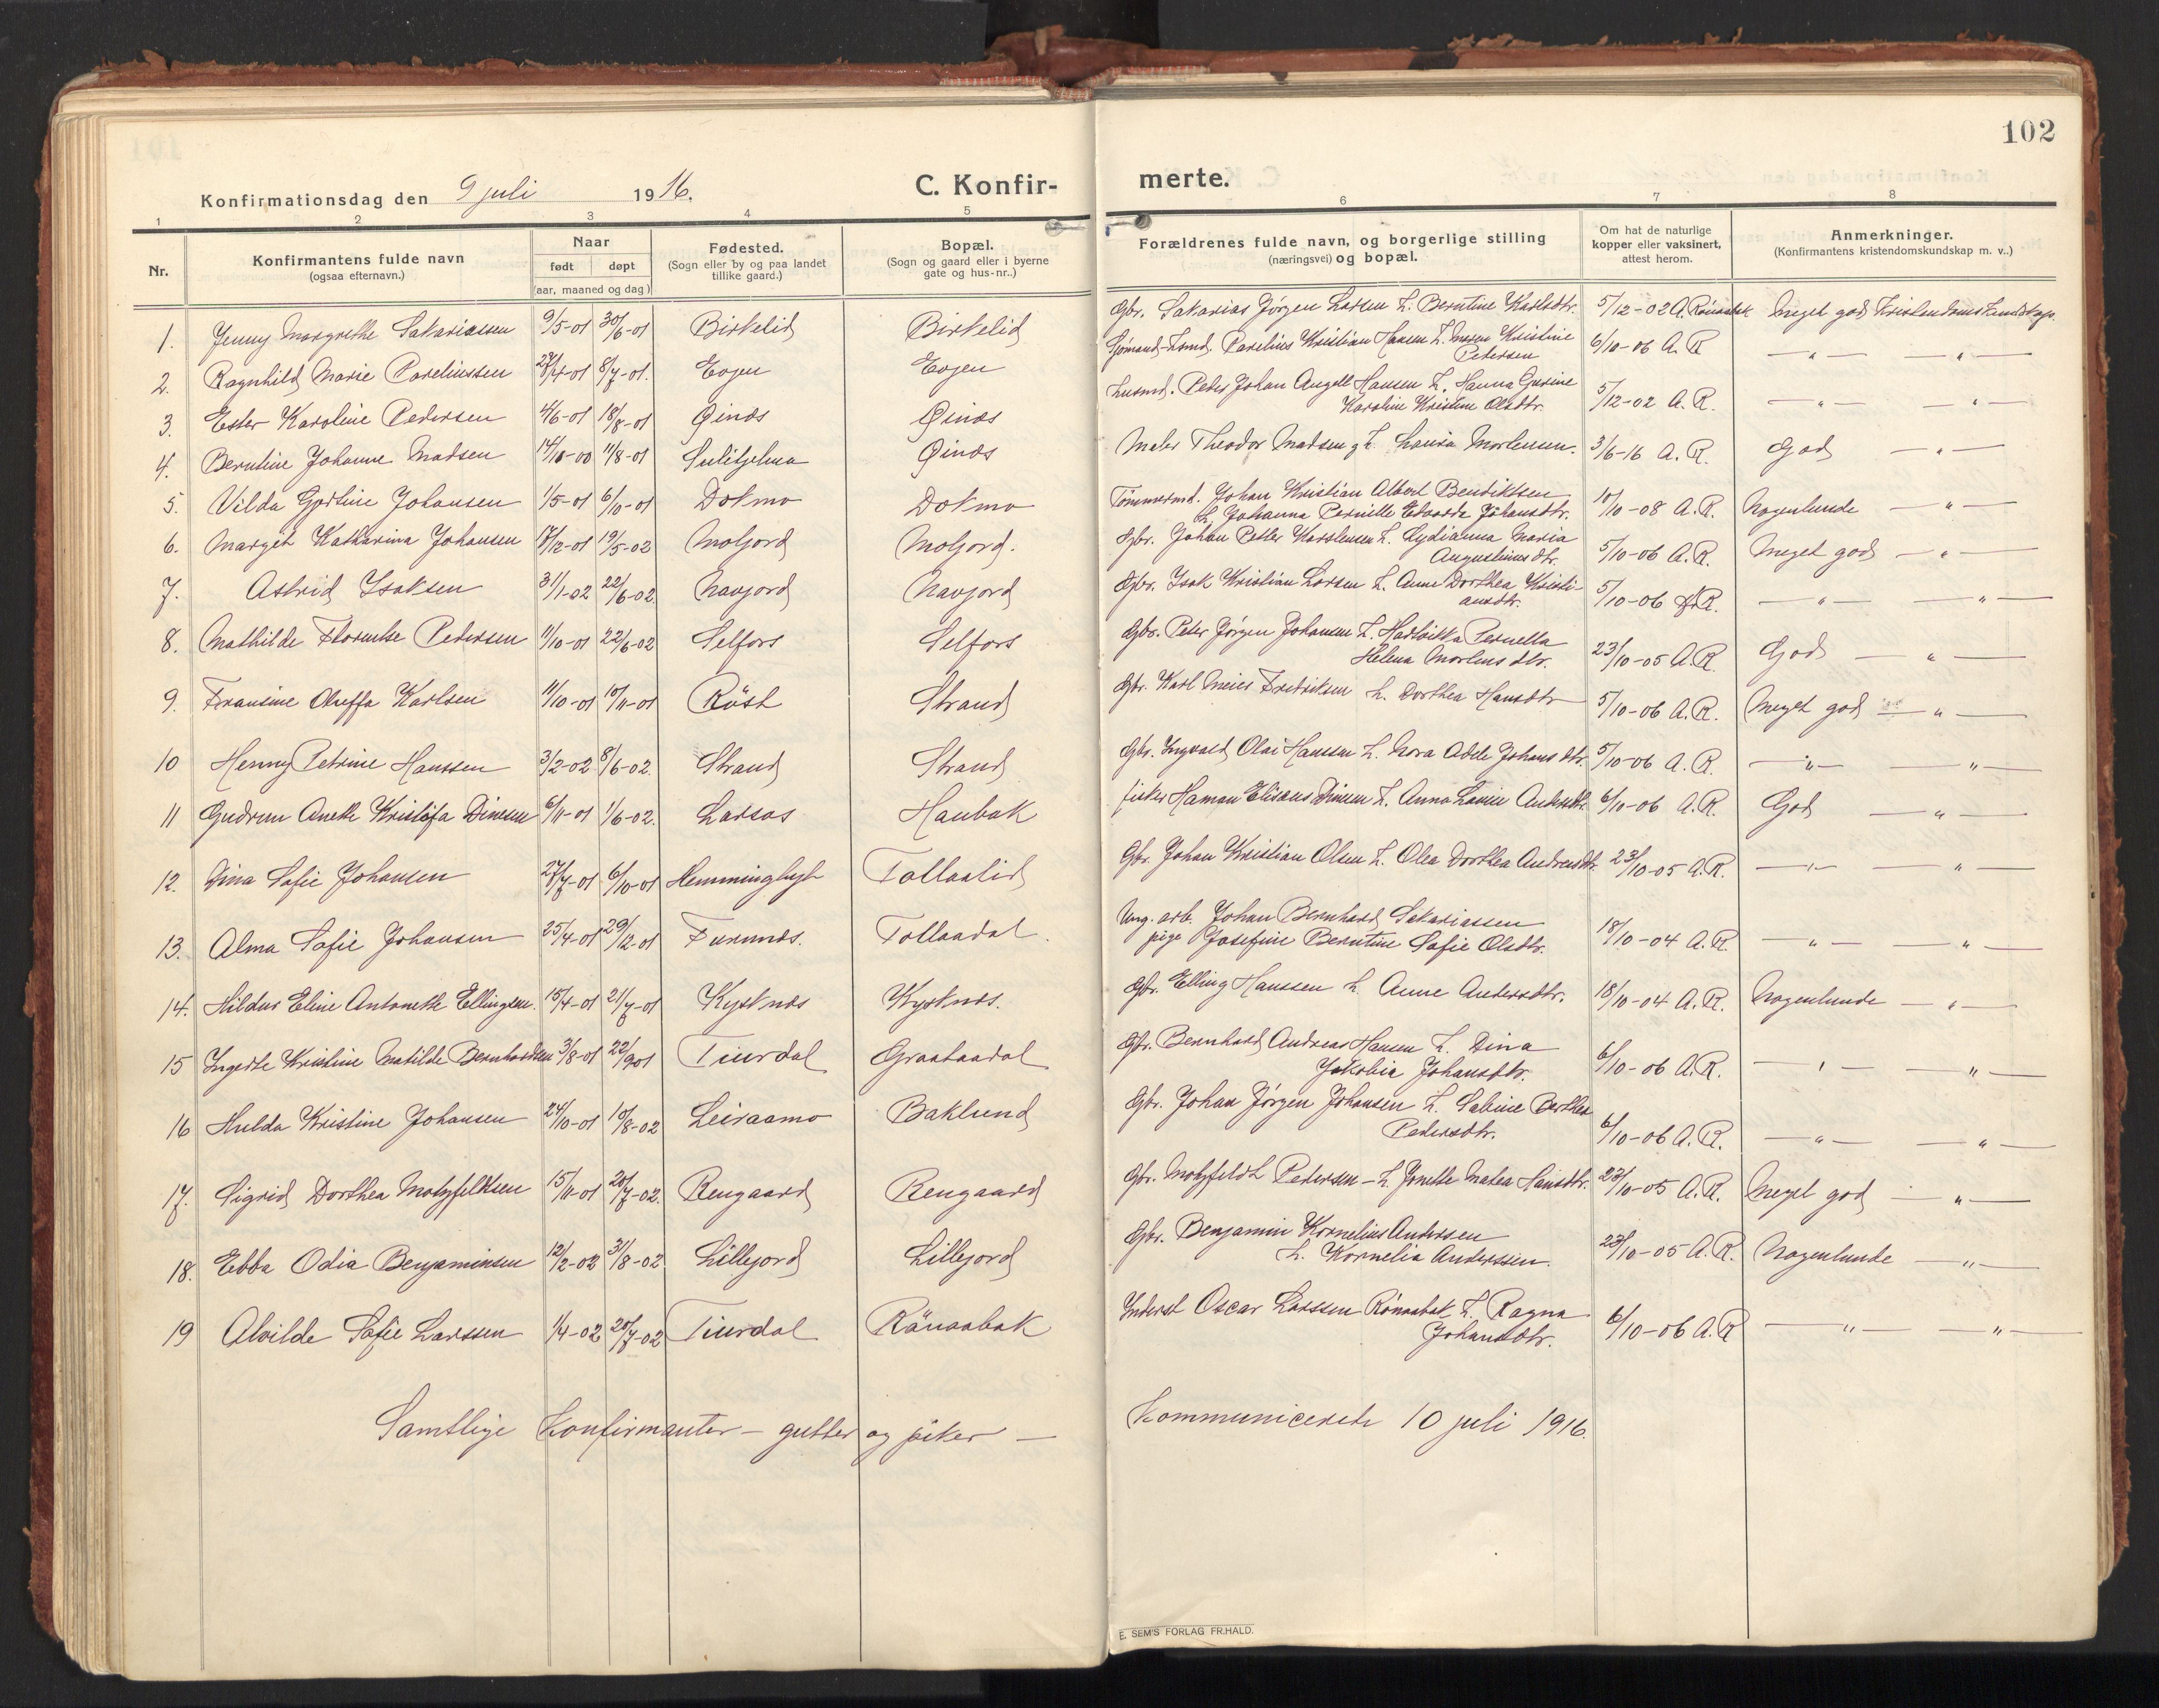 SAT, Ministerialprotokoller, klokkerbøker og fødselsregistre - Nordland, 846/L0650: Ministerialbok nr. 846A08, 1916-1935, s. 102